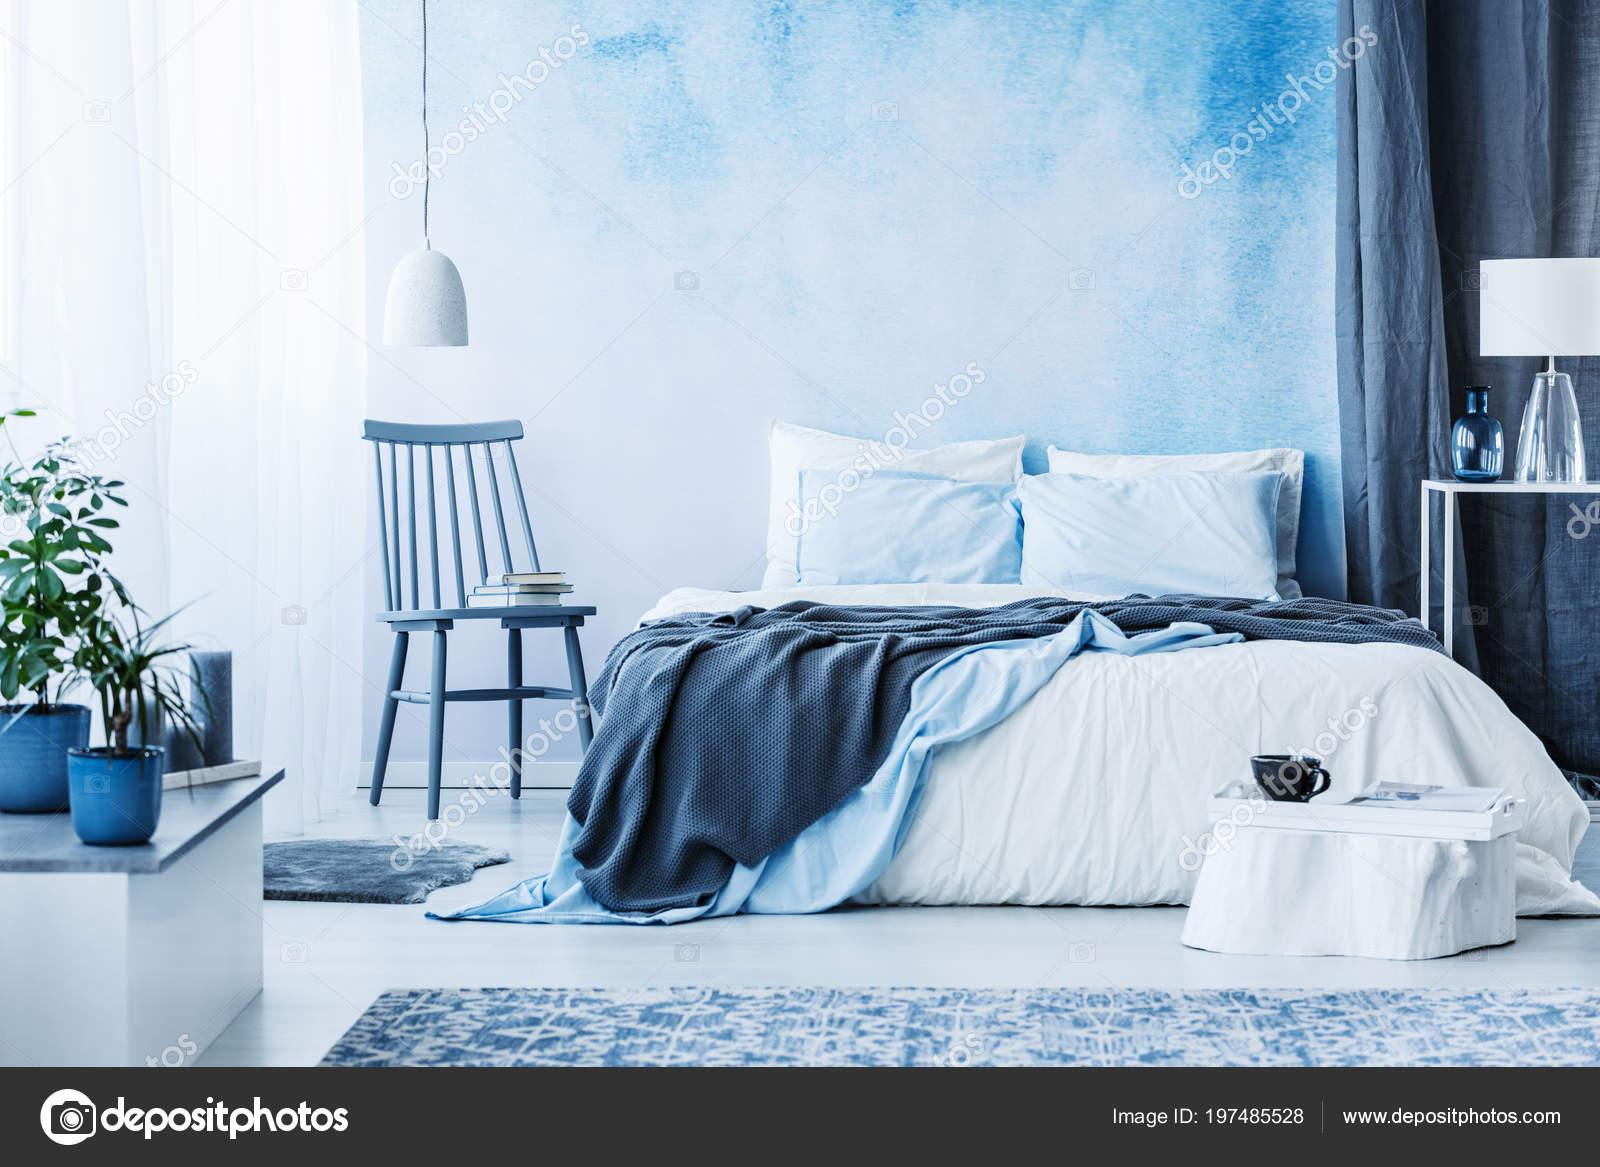 Blue Chair Next Bed Grey Blanket Cozy Bedroom Interior ...